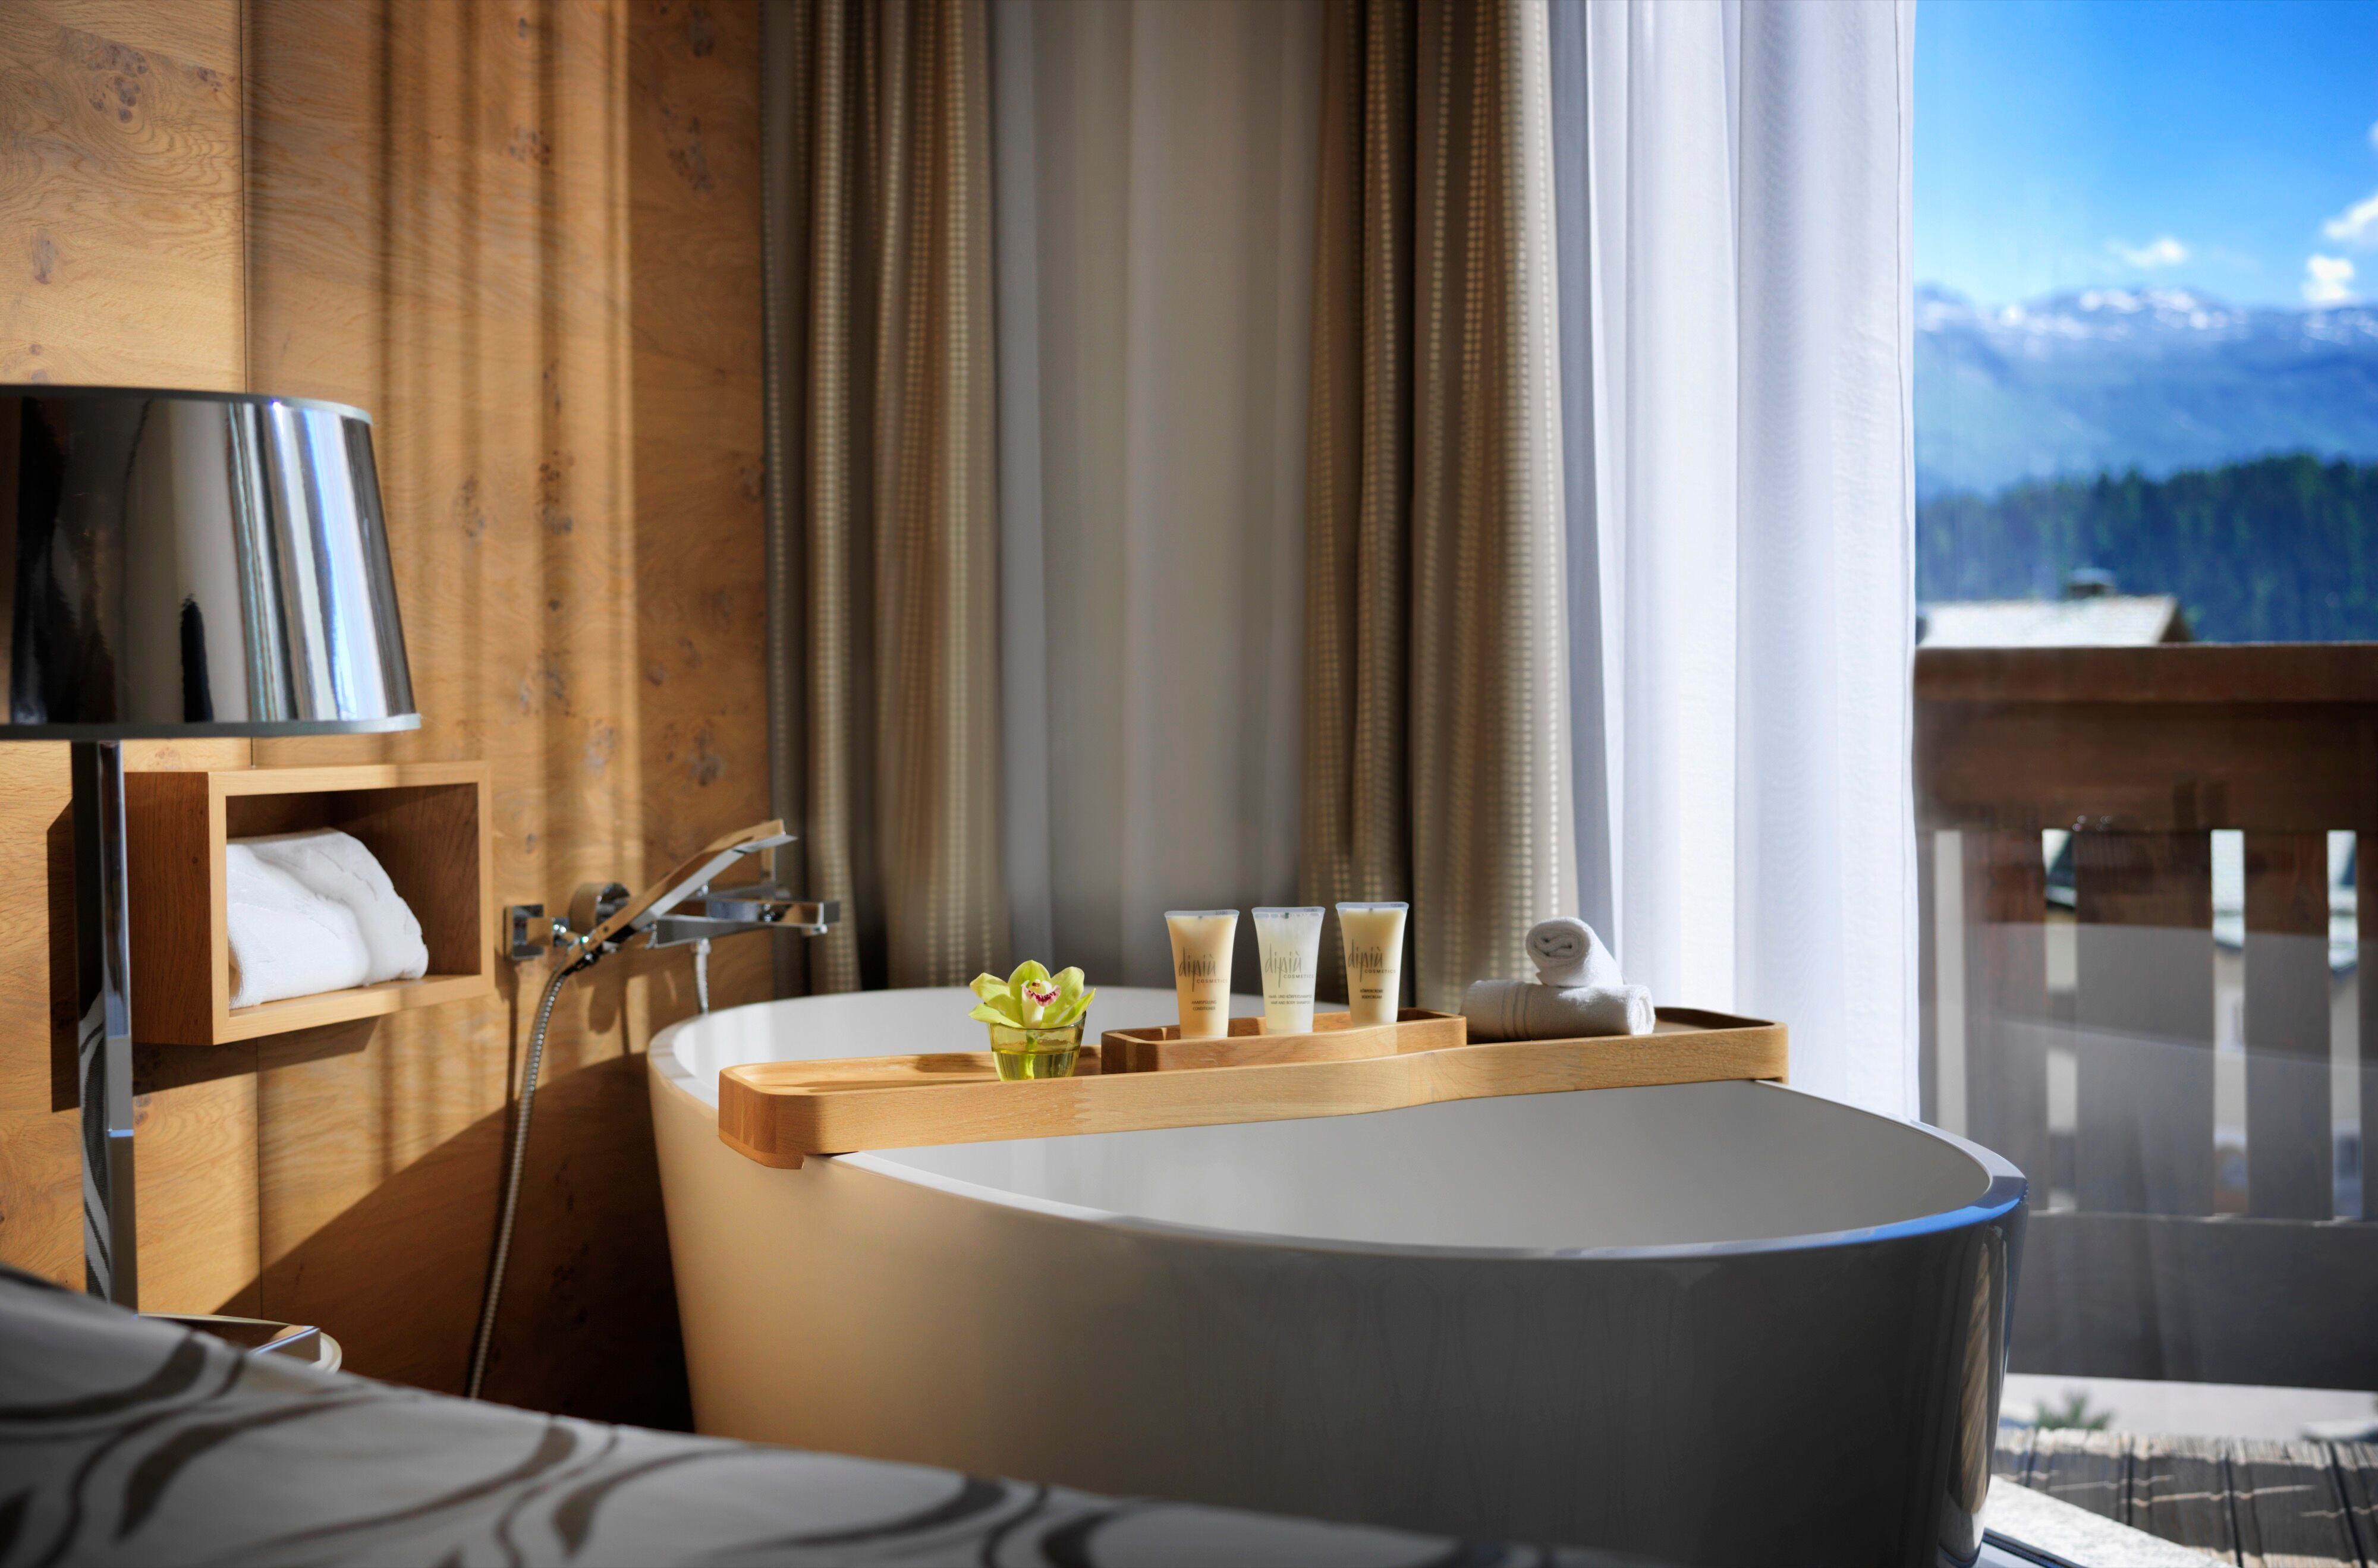 Large room bath